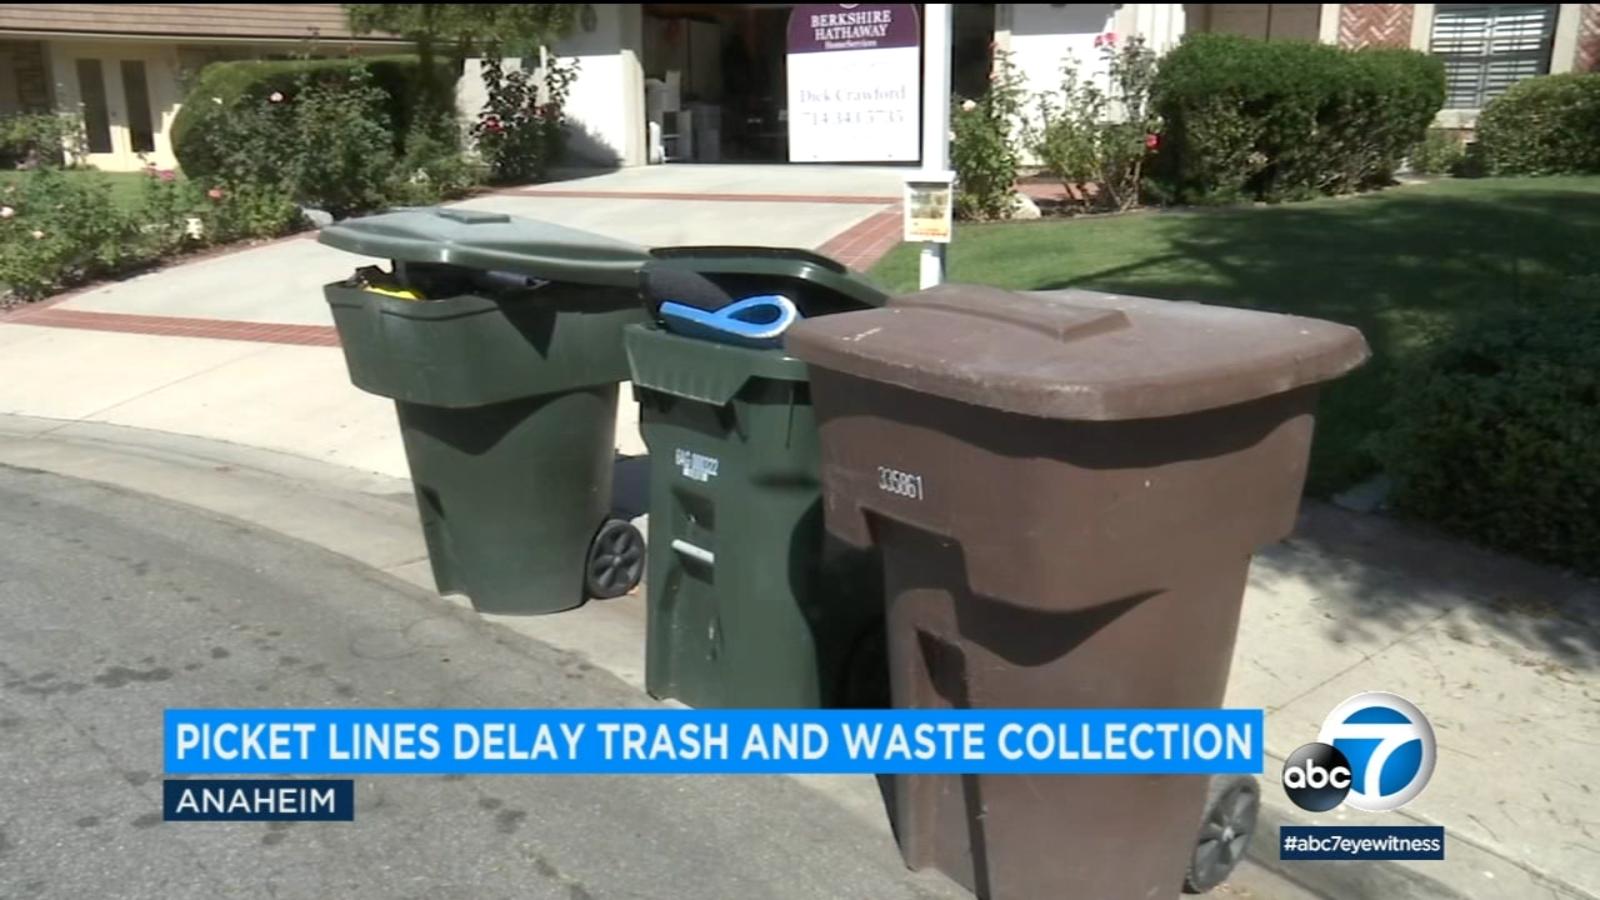 East Coast strike delays some waste pickup in Orange County